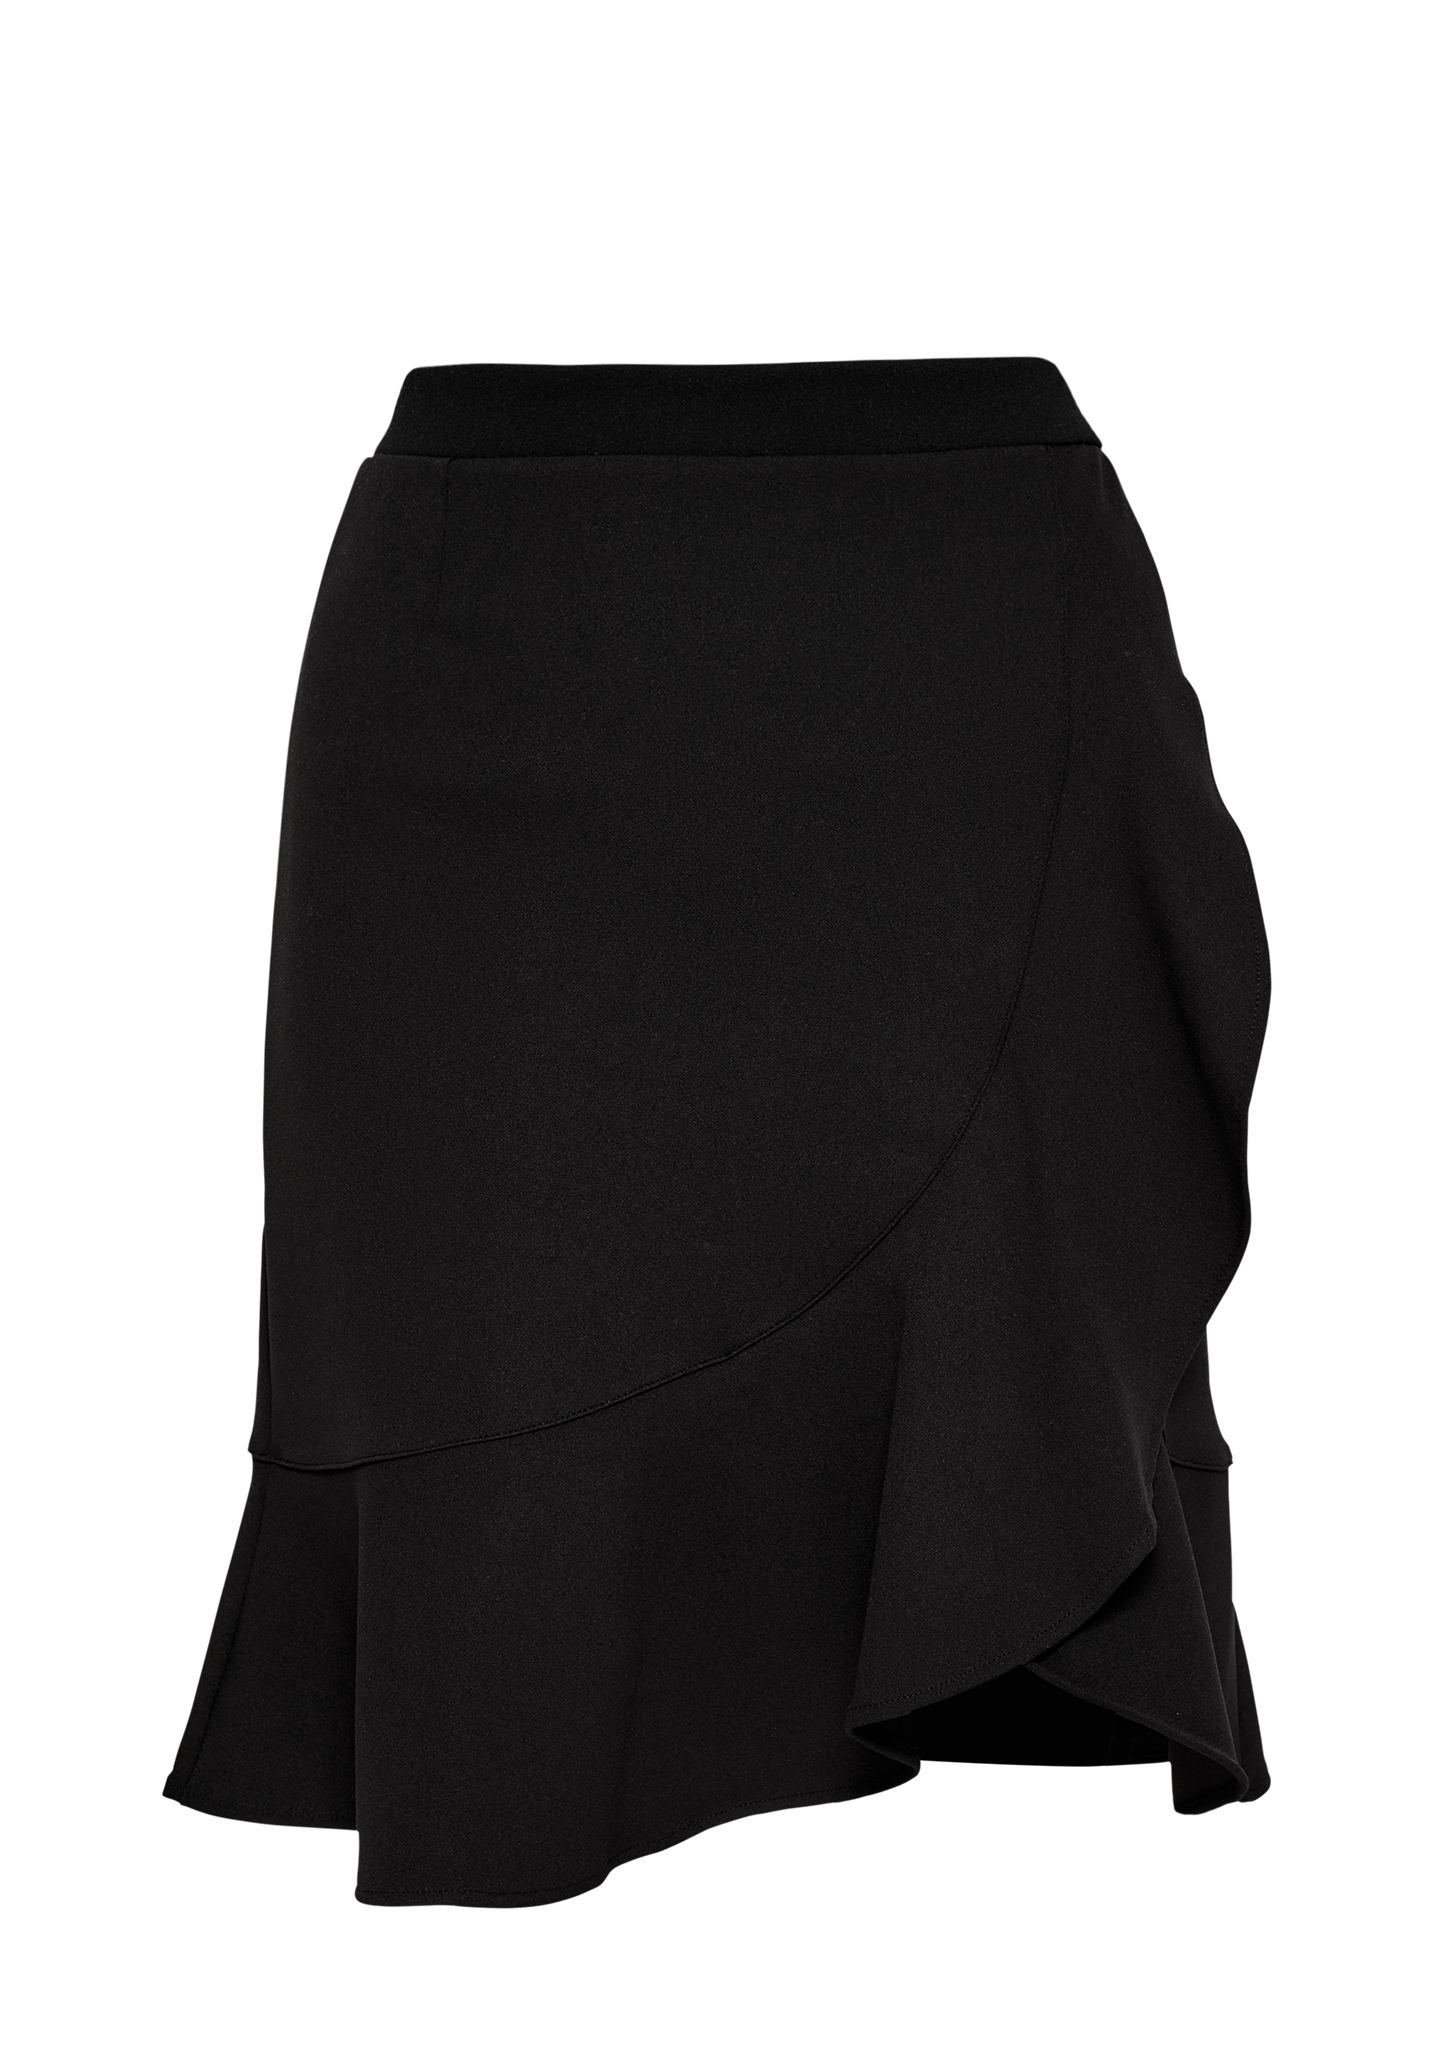 Volantrock | Bekleidung > Röcke > Stufenröcke & Volantröcke | Schwarz | 95% polyester -  5% elasthan | s.Oliver